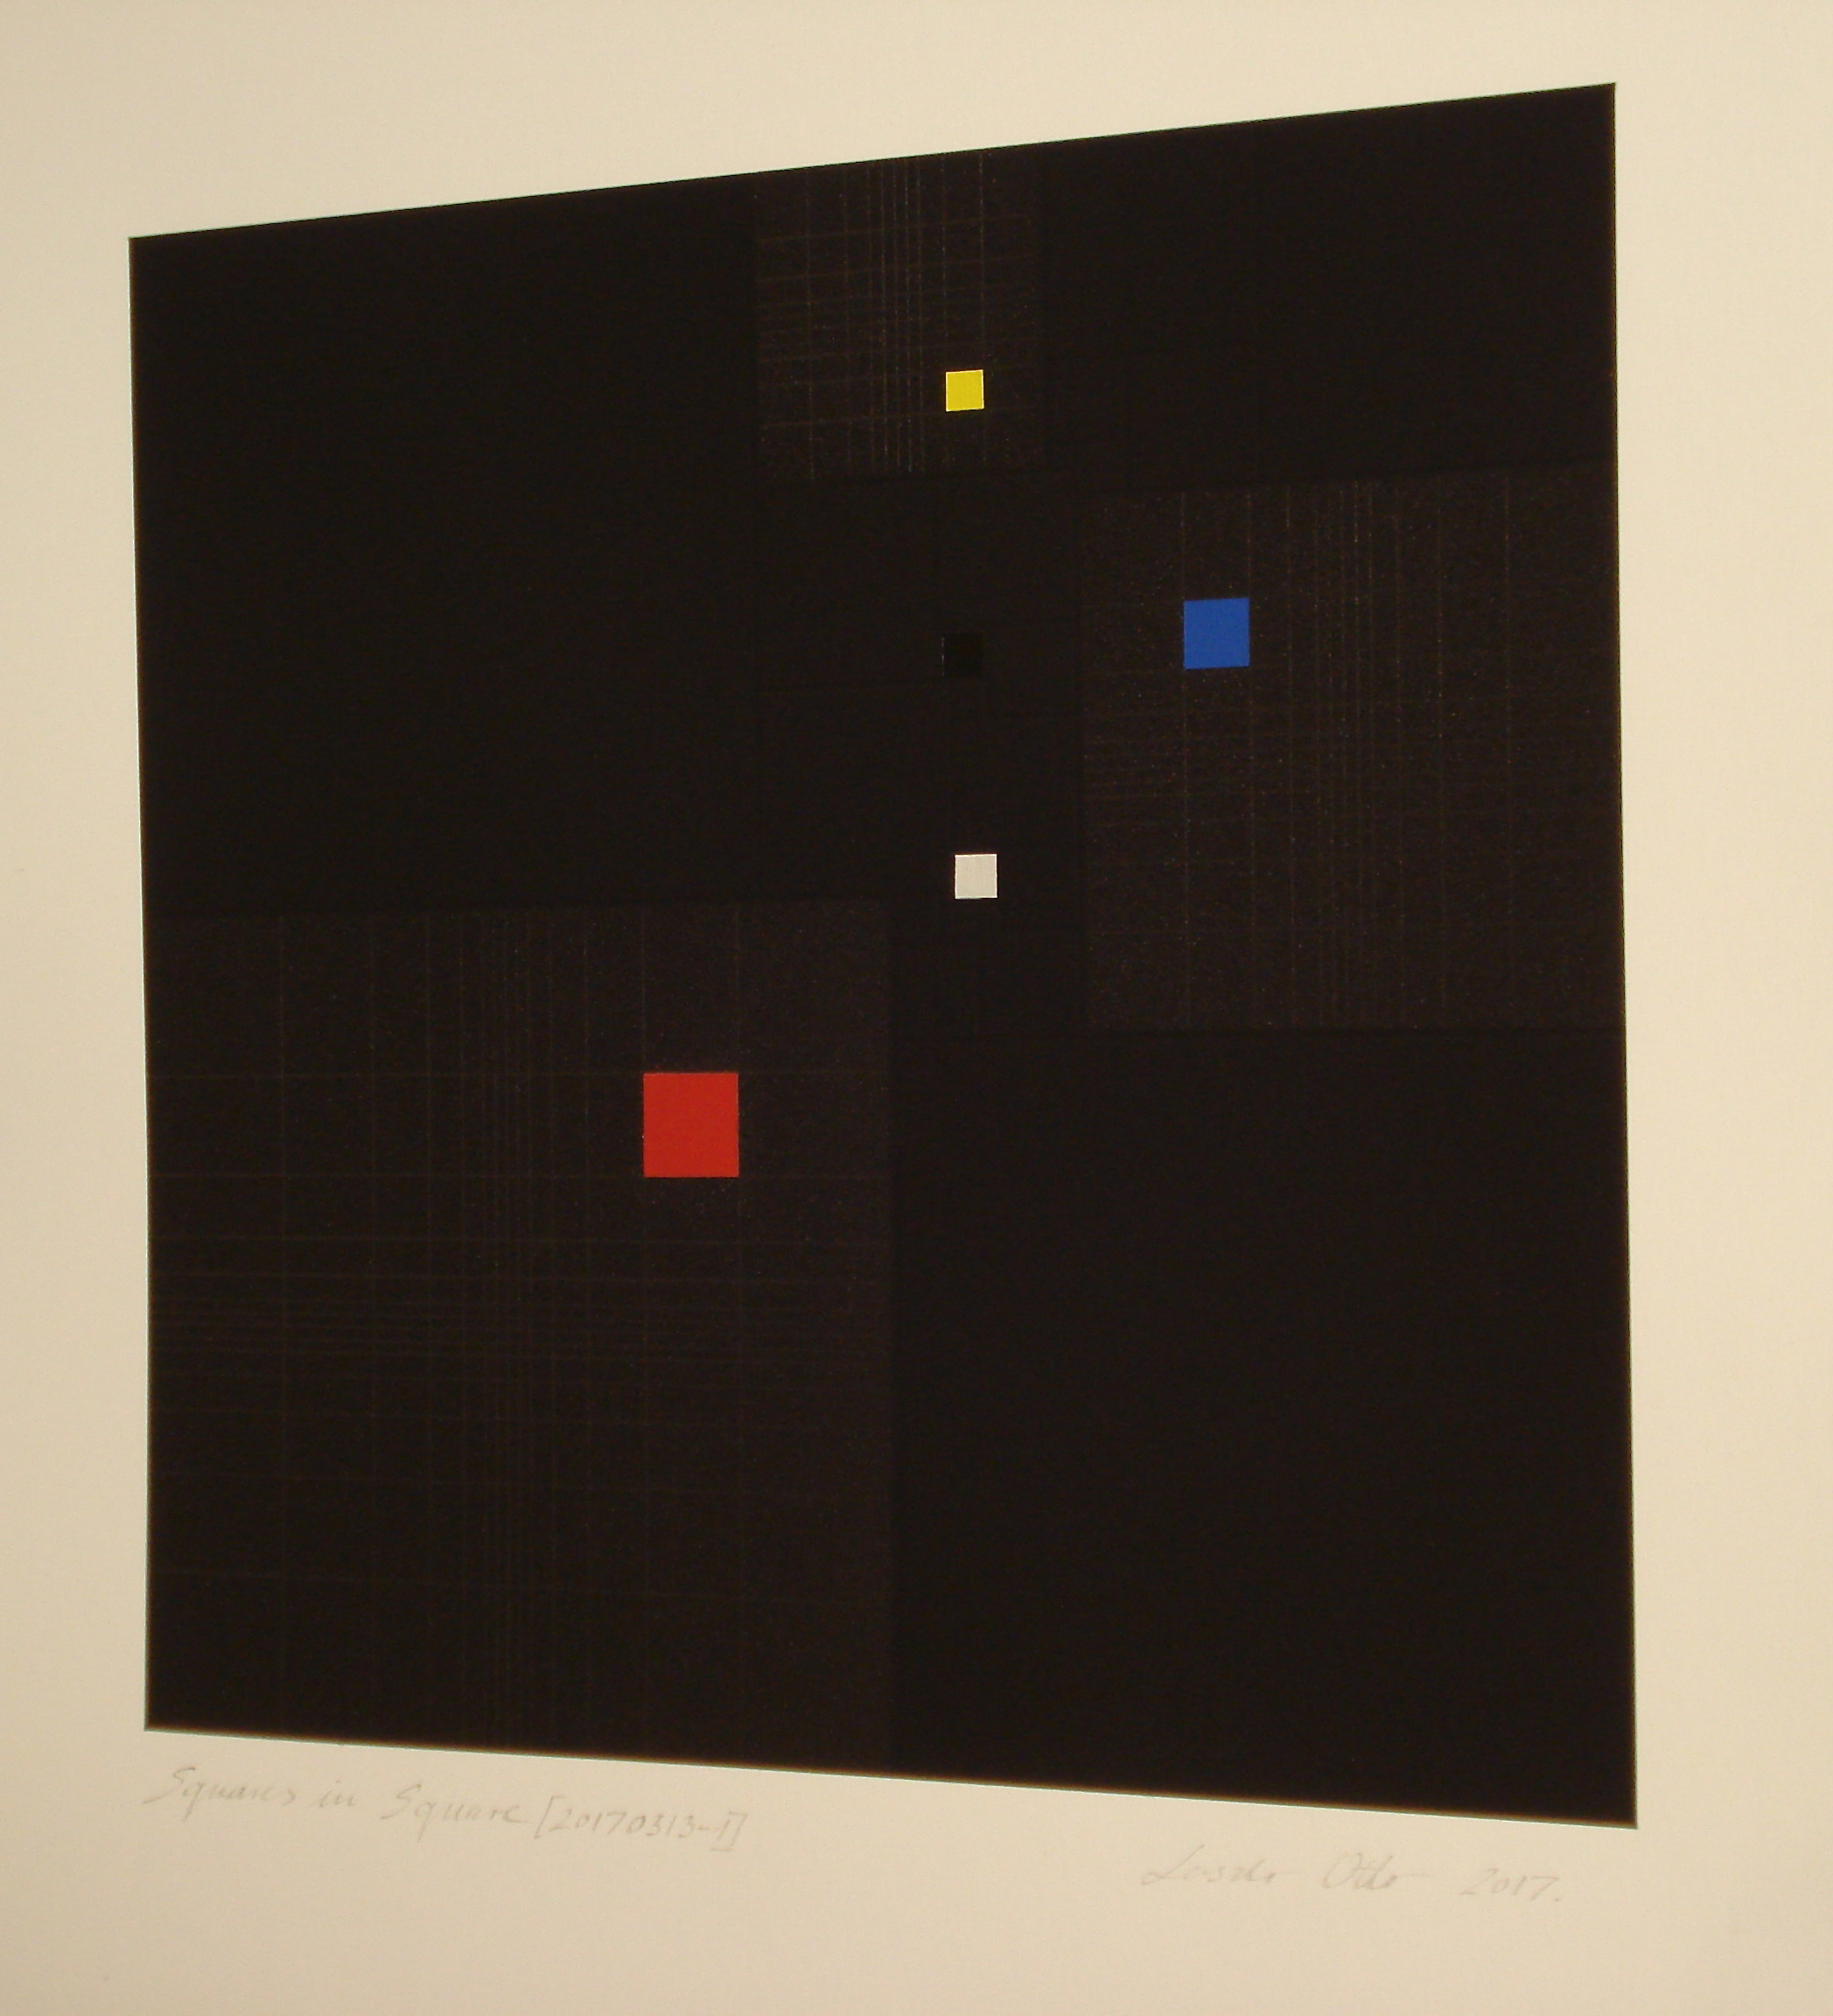 Squares in Square + Fibonacci-sequence [20170313-2], 2017, pigment, acrylic on paper, 14 x 13 13/16 in. [35.5x35cm]2